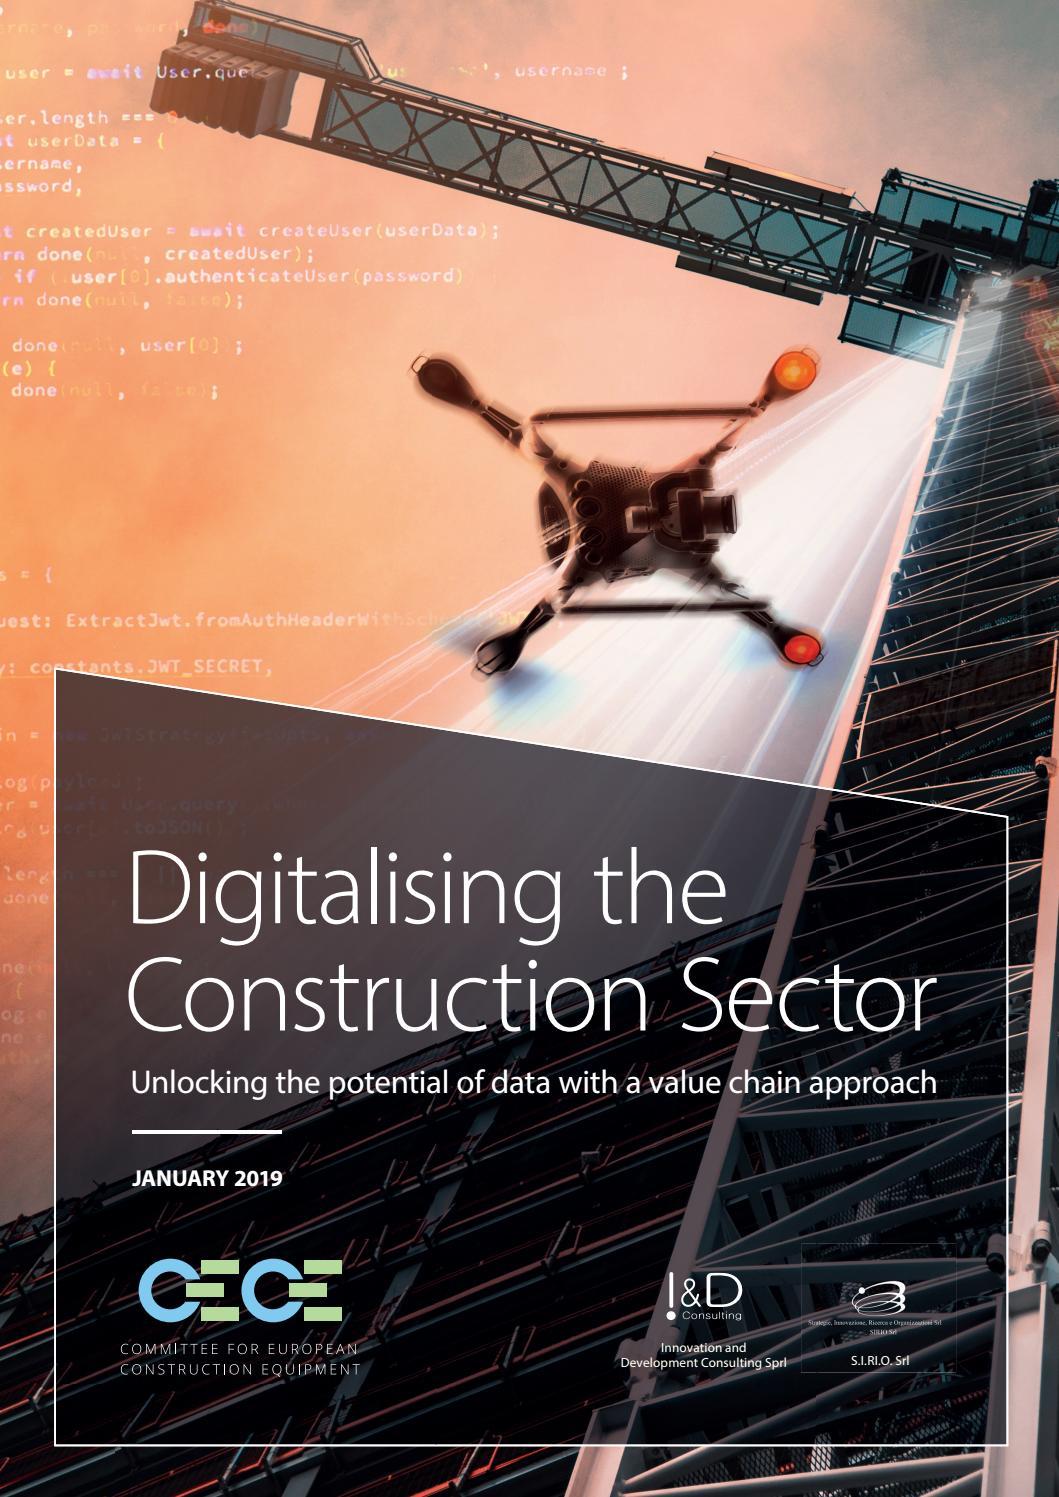 Digitalising the Construction Sector: Unlocking the